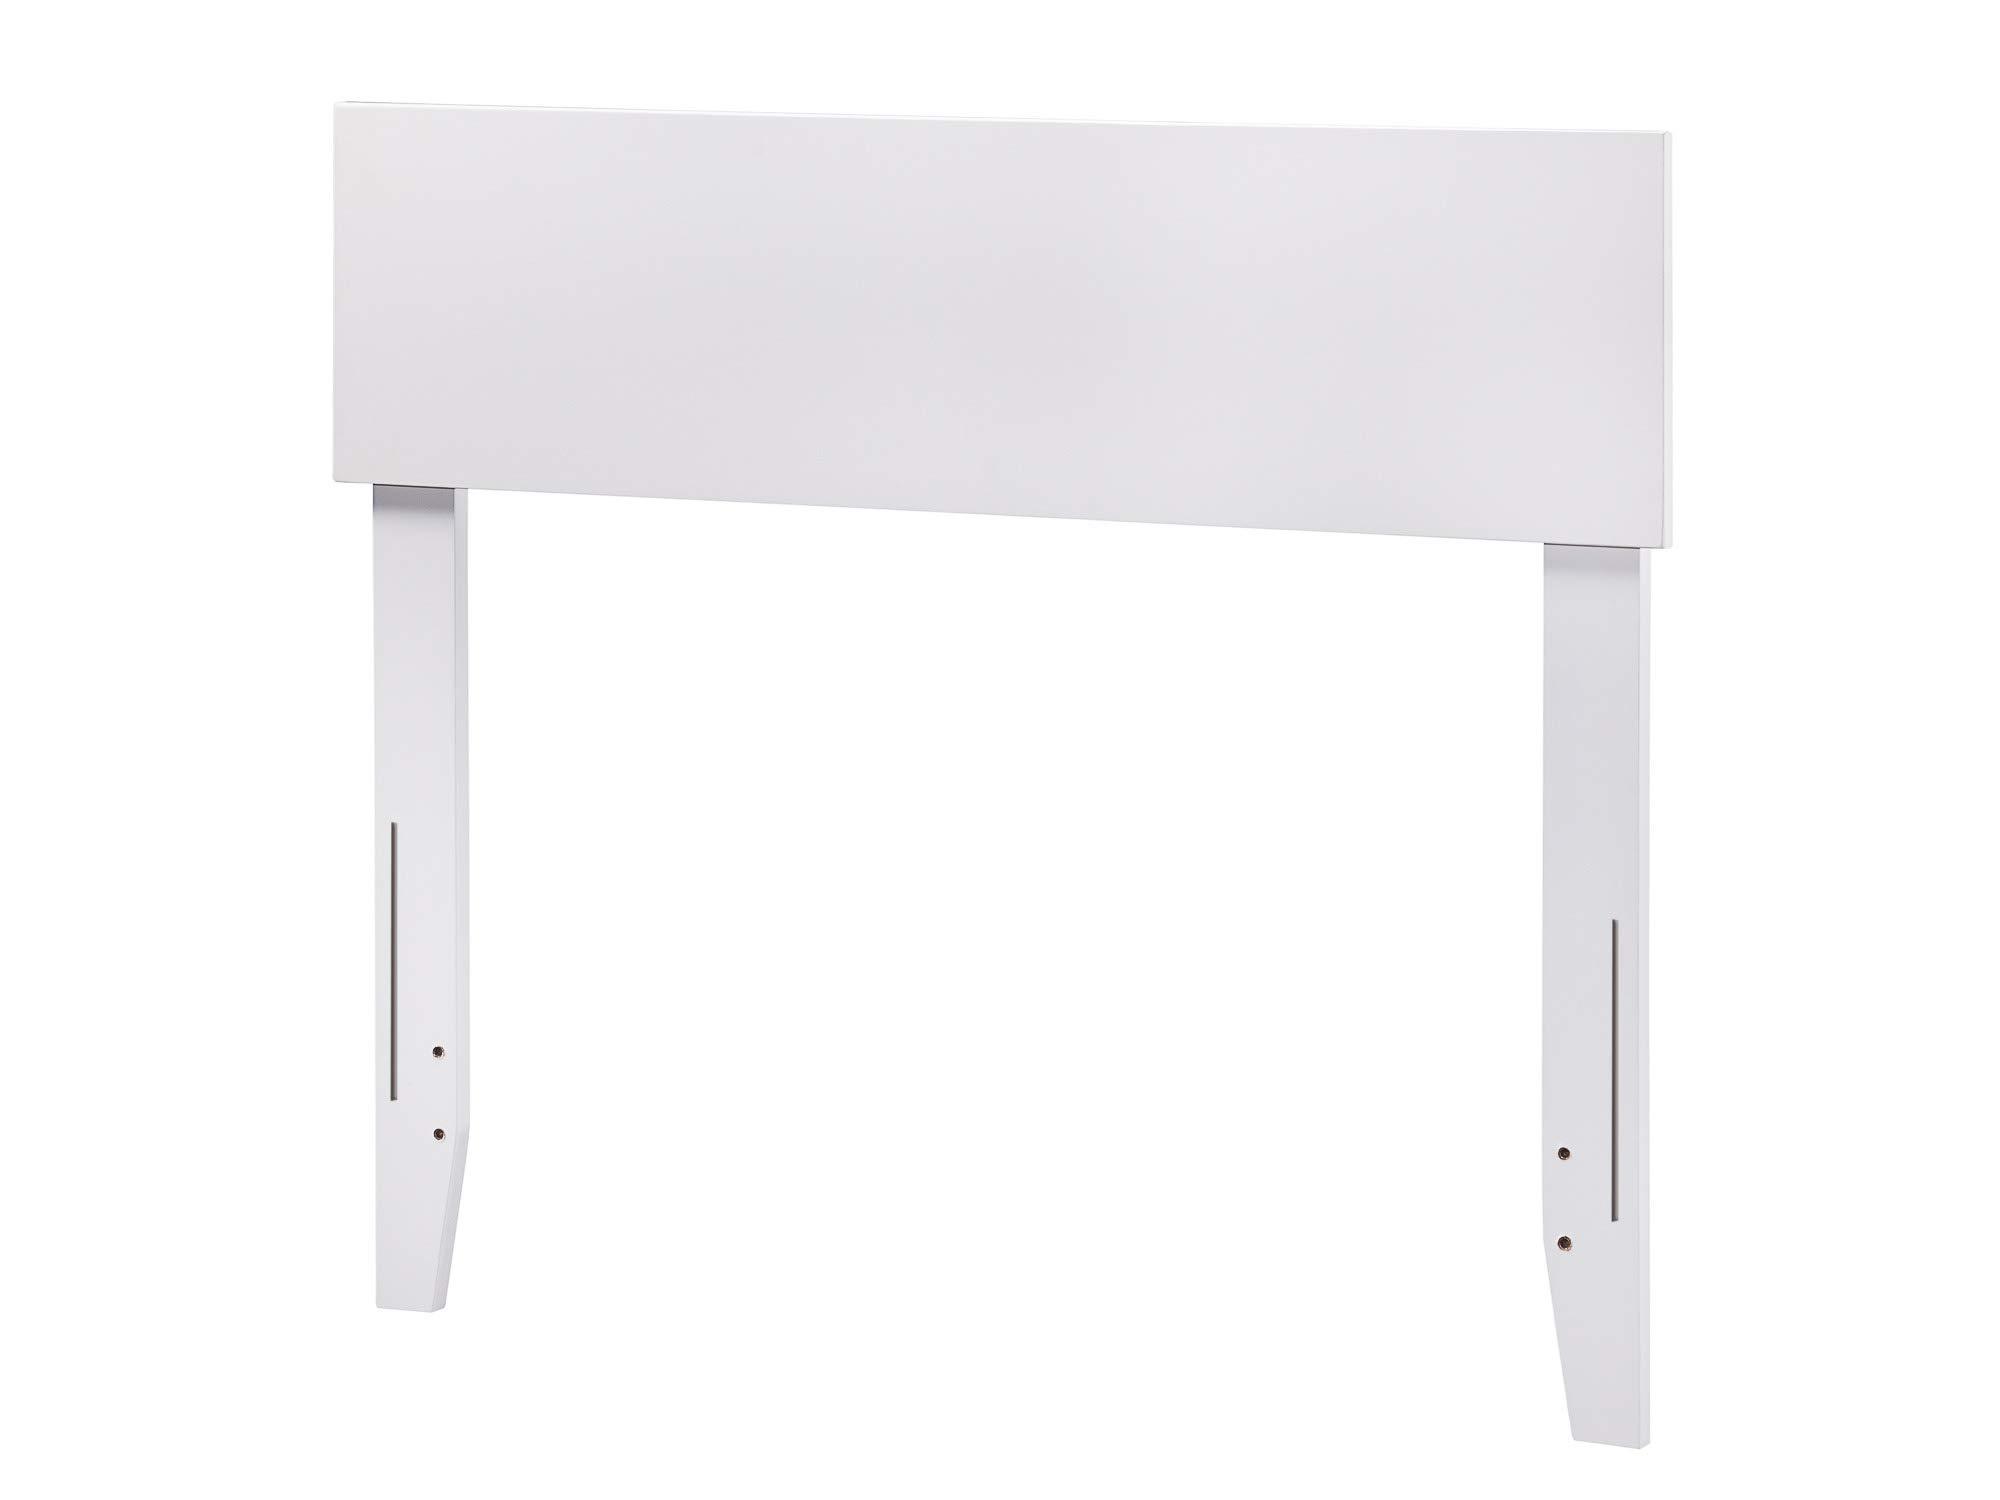 Atlantic Furniture AR281822 Orlando Headboard, Twin, White by Atlantic Furniture